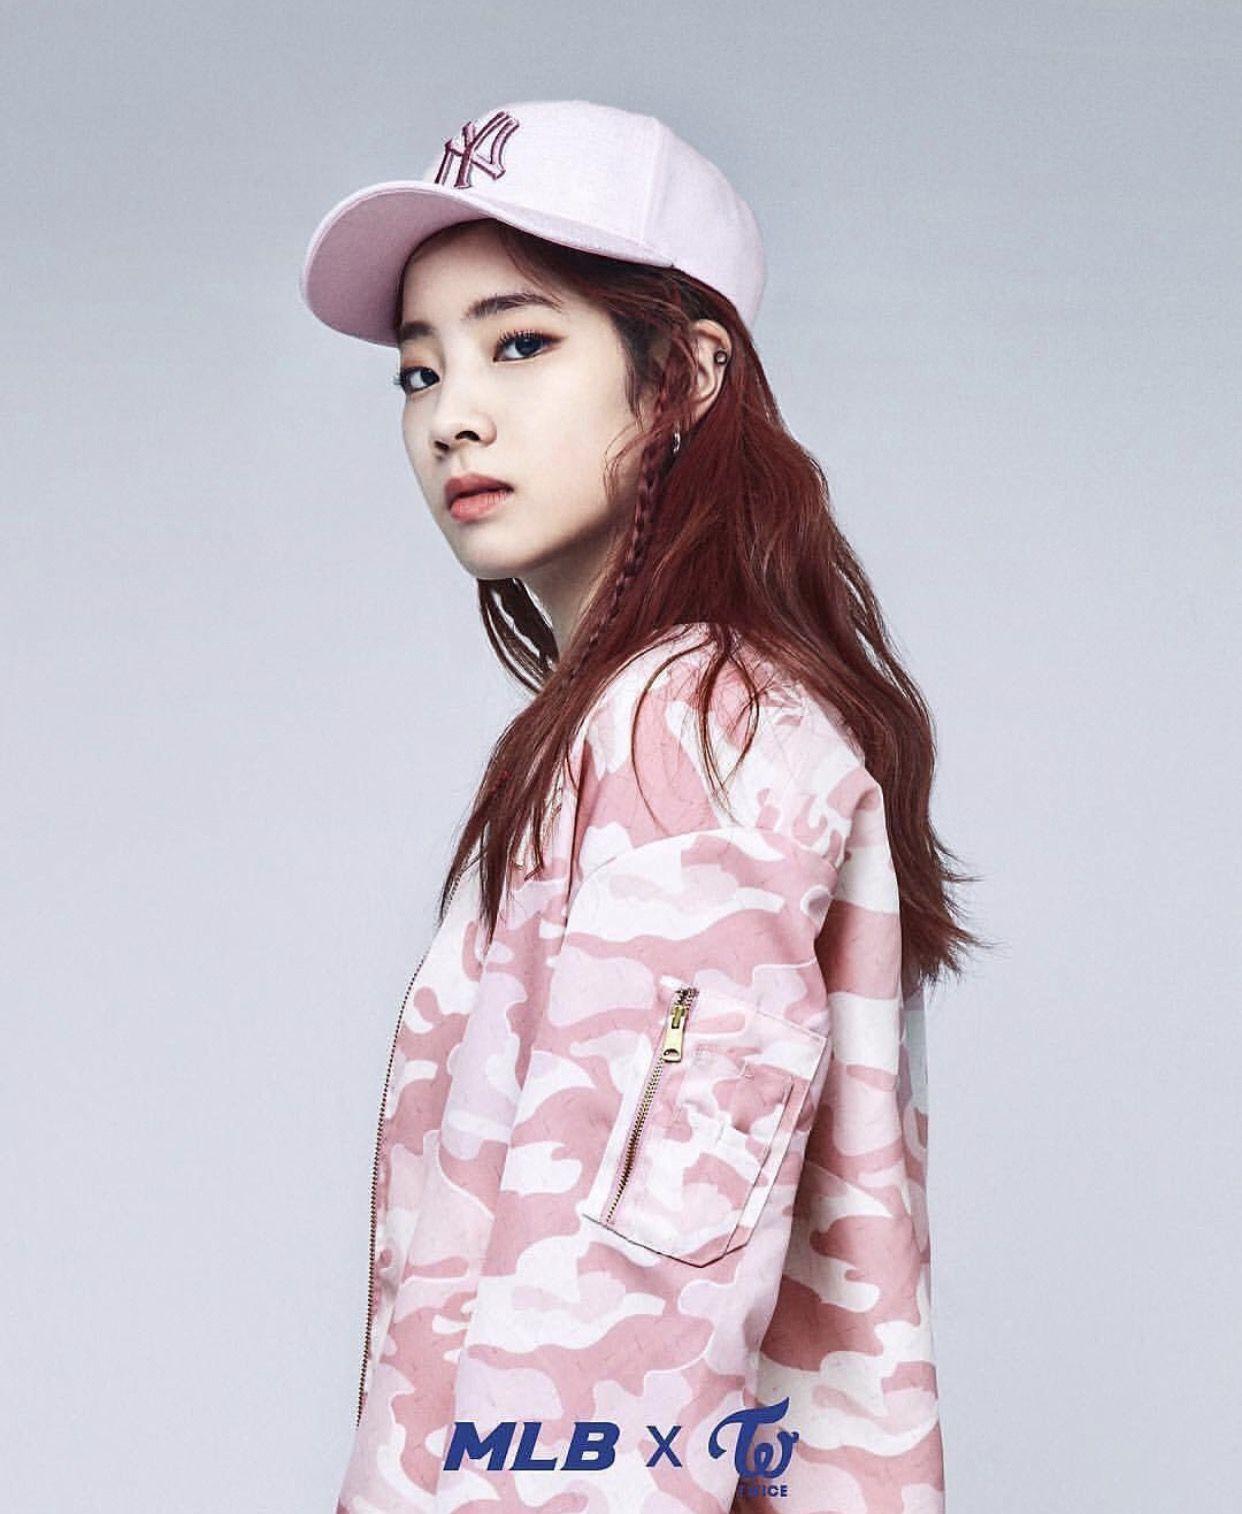 Cute Tofu Desktop Wallpaper Mlb X Twice Dahyun 女 ⛅️ Twice Dahyun Kpop Kpop Girl